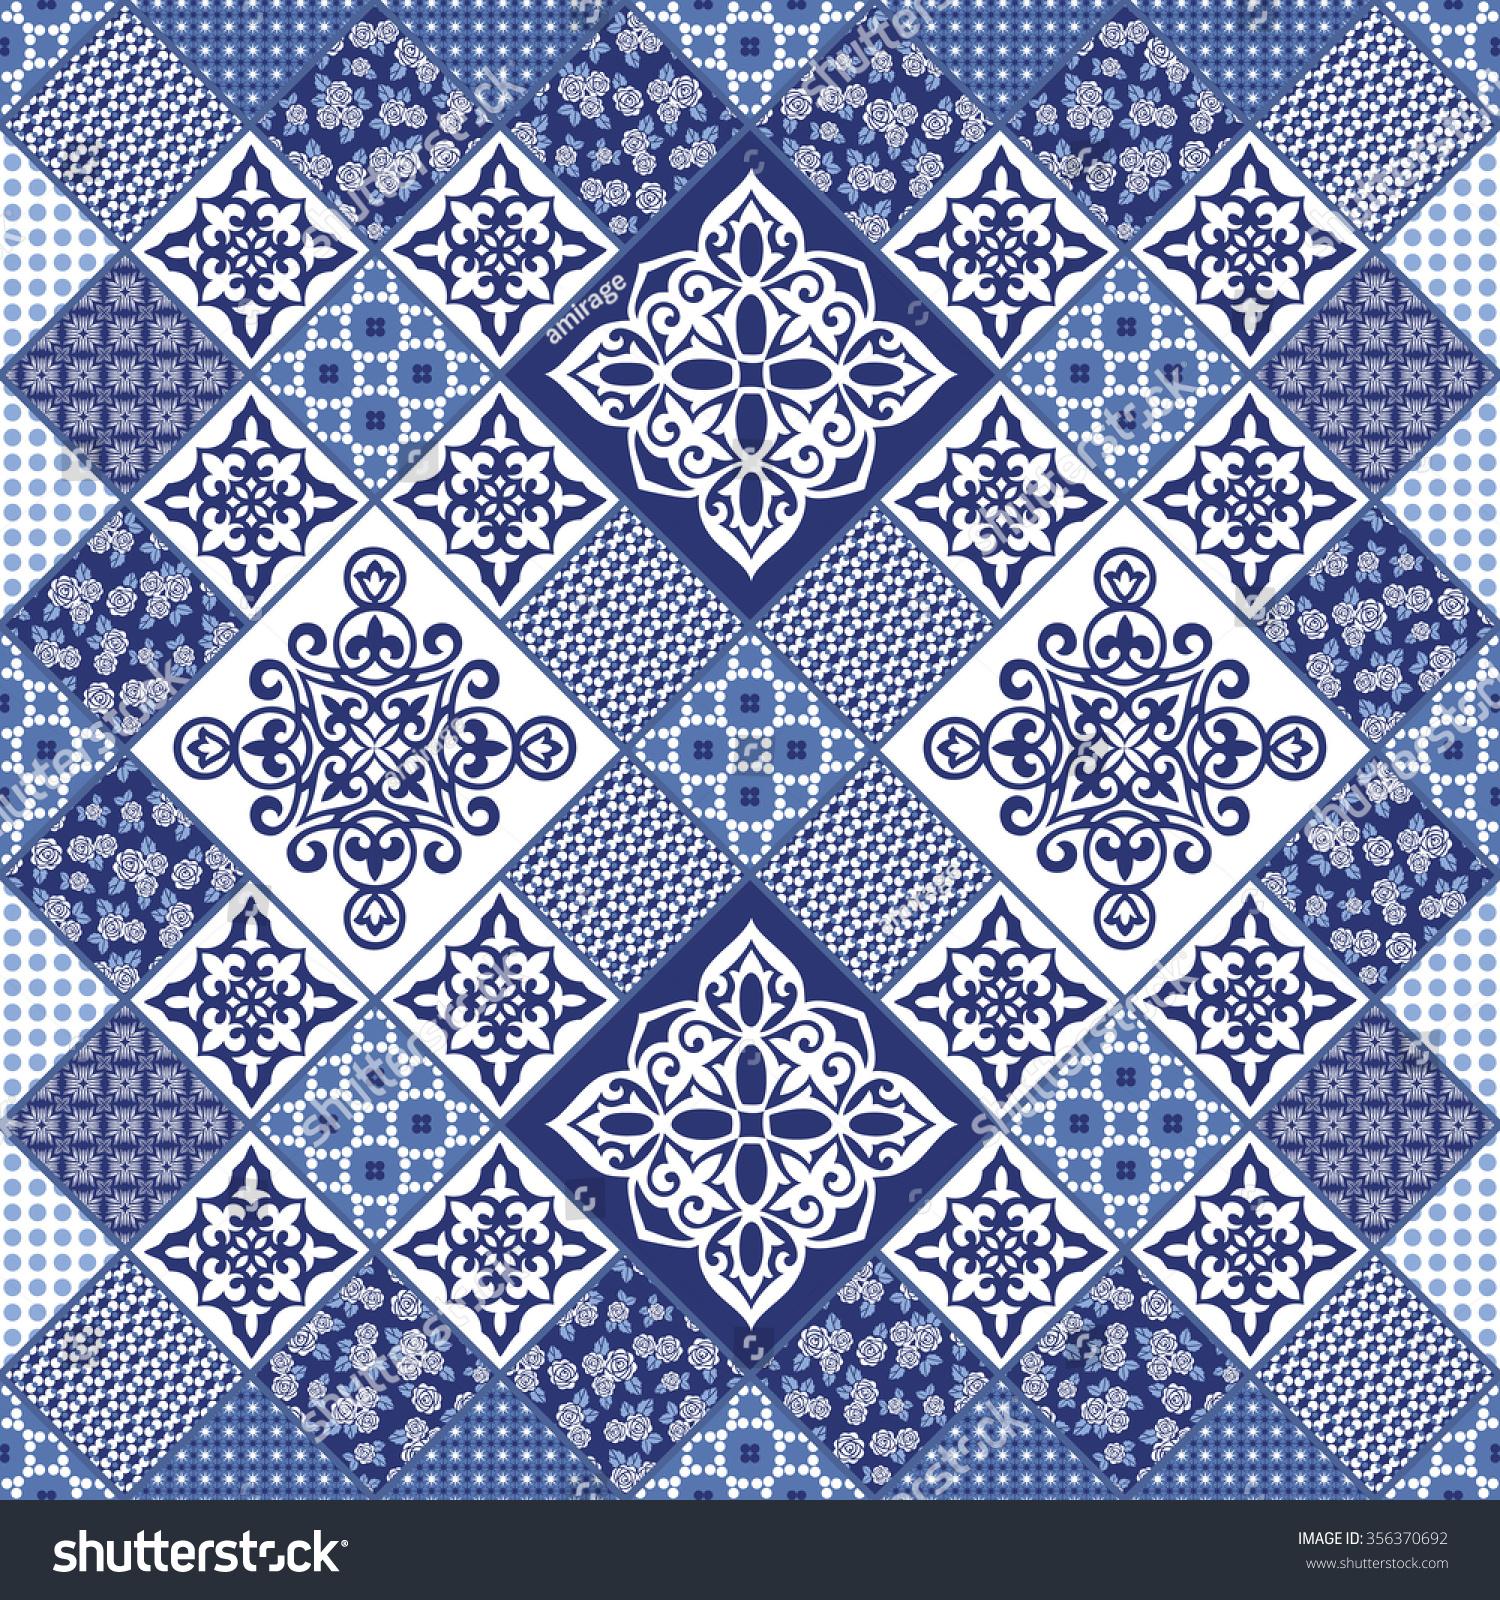 Moroccan geometric pattern royalty free stock photos image 13547078 - Gorgeous